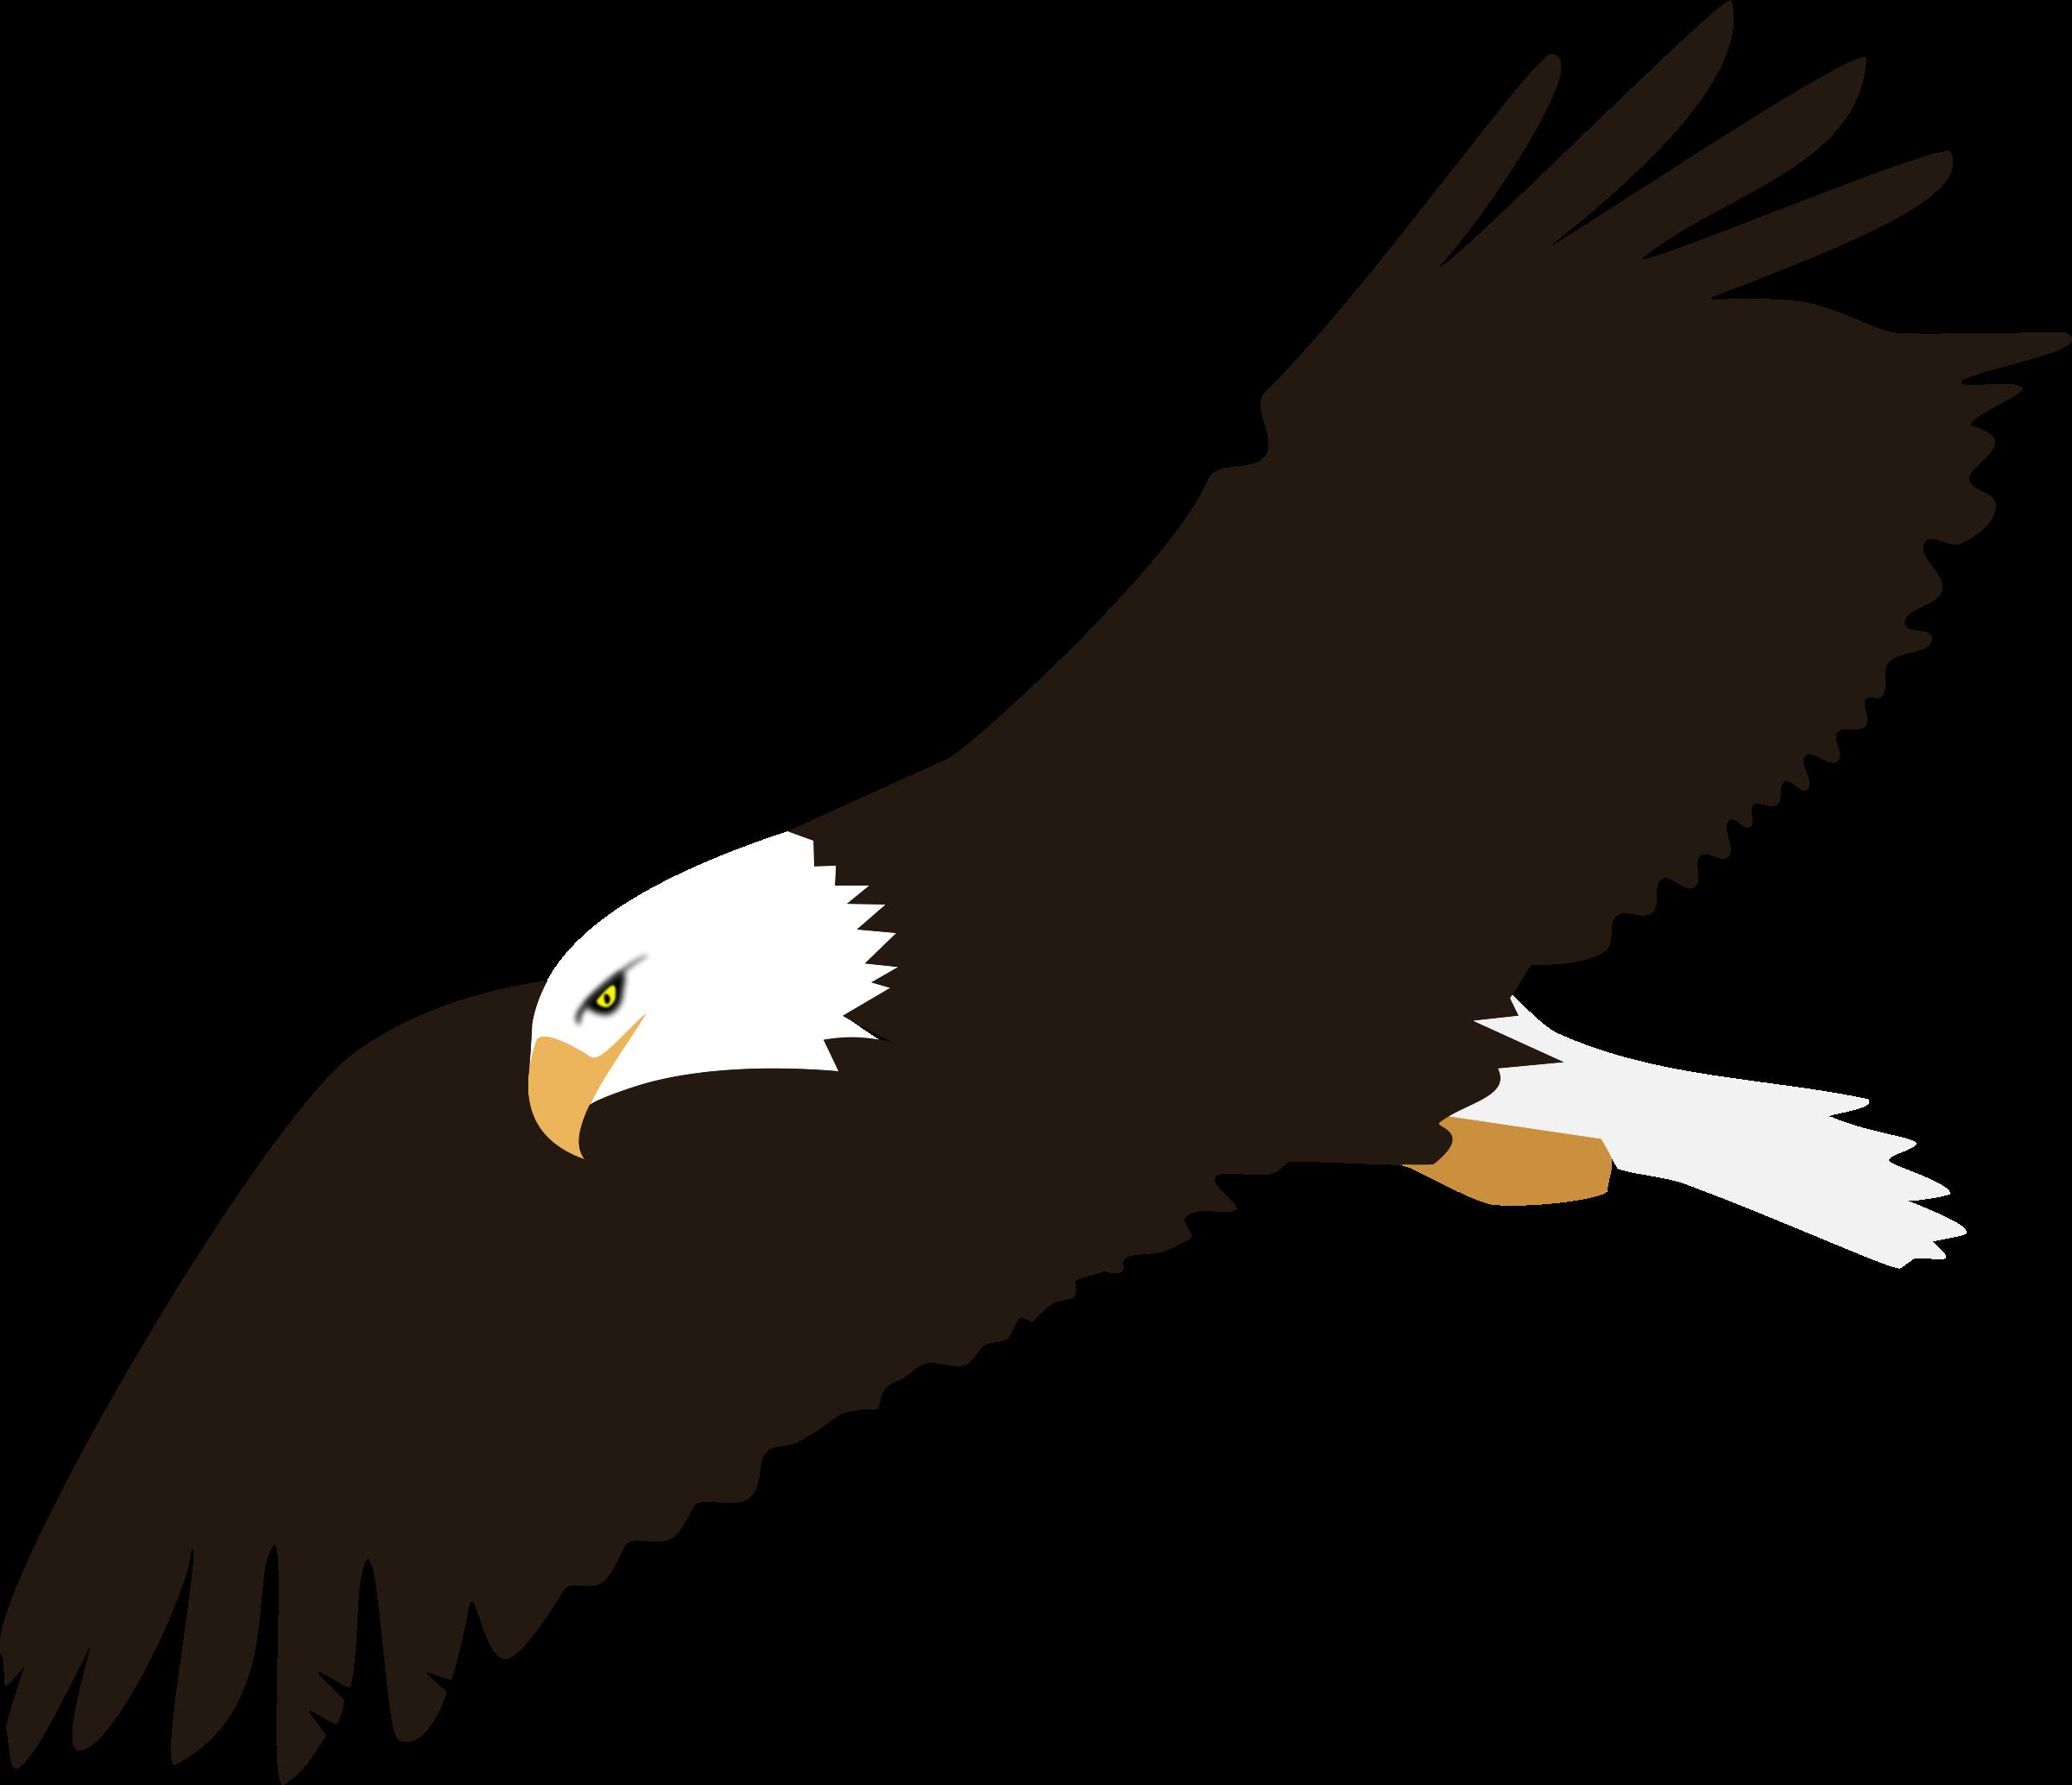 soaring bald eagle vector clipart image free stock photo public rh goodfreephotos com american bald eagle vector bald eagle vector brush photoshop